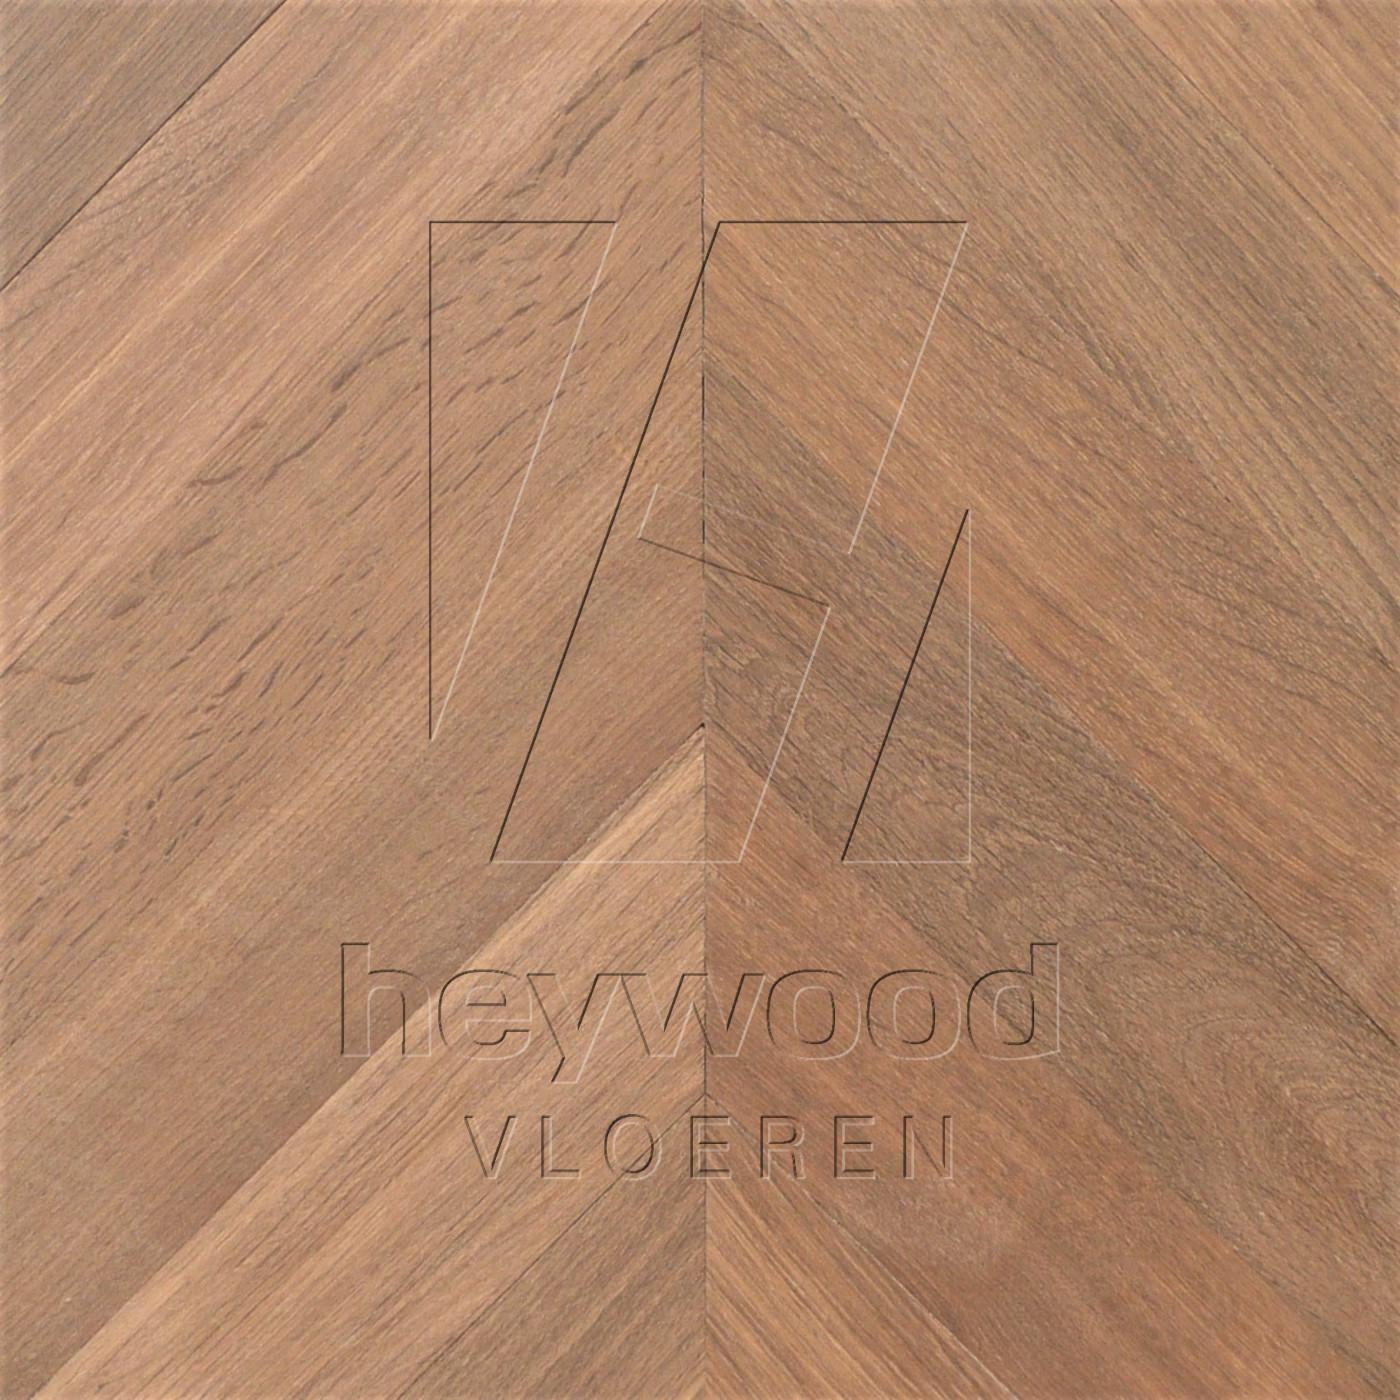 'Nanga Parbat coloured' Chevron 45°, Bespoke Elegance in Chevron of Pattern & Panel Floors